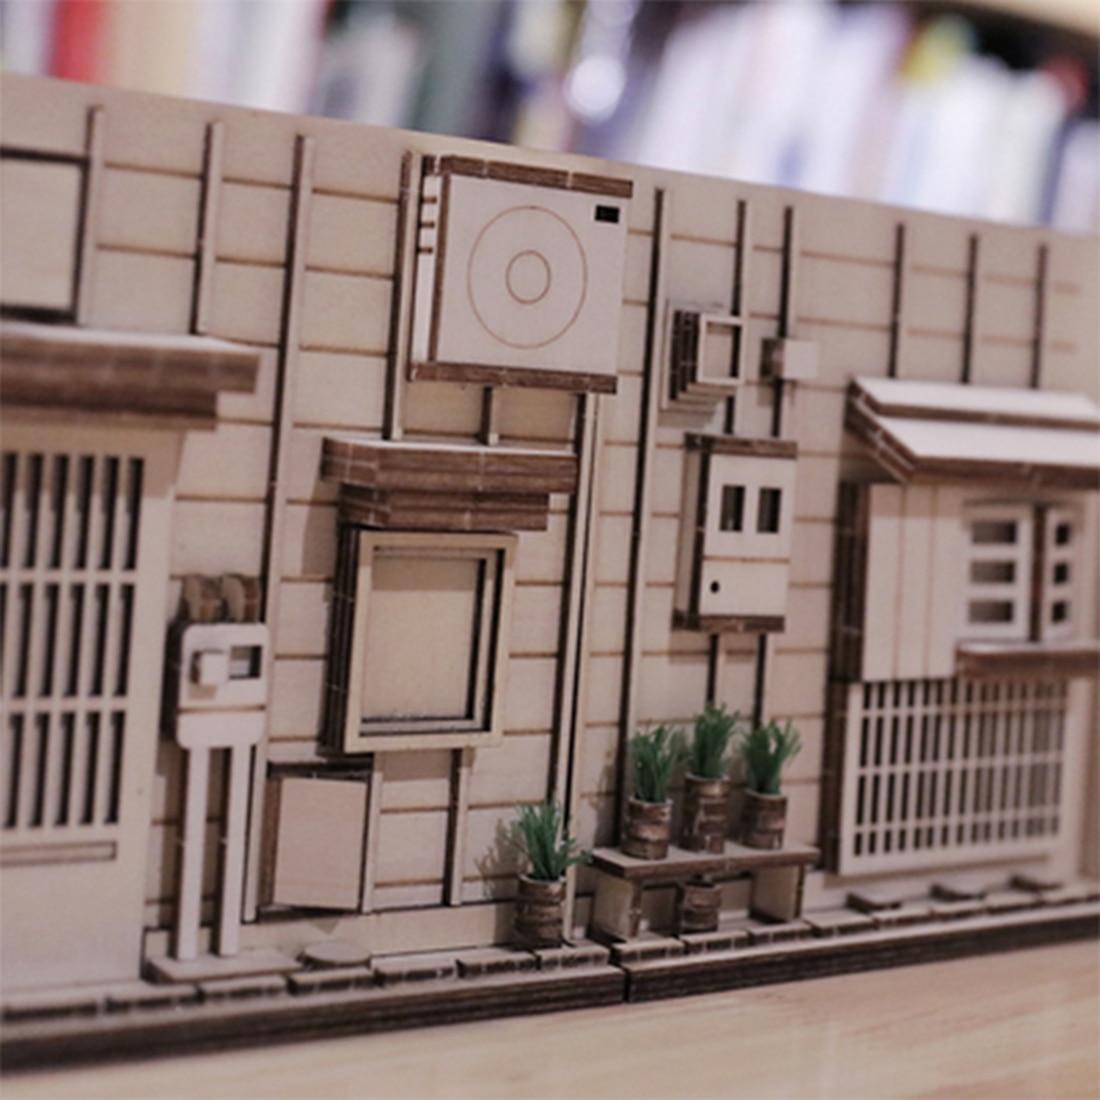 Hd80931d689814e6d9af5e1439e15371cf - Robotime - DIY Models, DIY Miniature Houses, 3d Wooden Puzzle